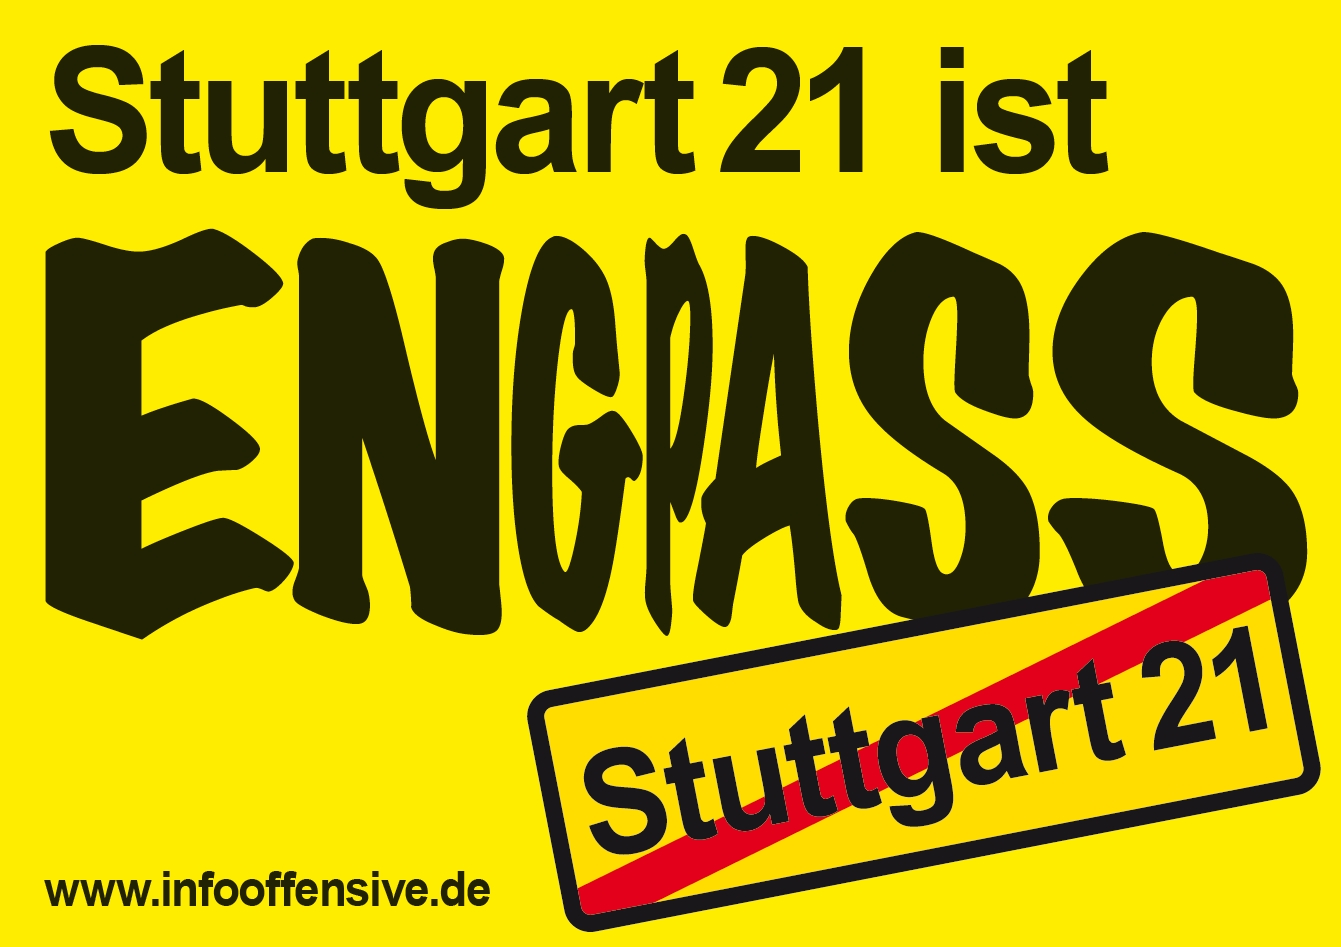 Stuttgart 21 ist Engpass